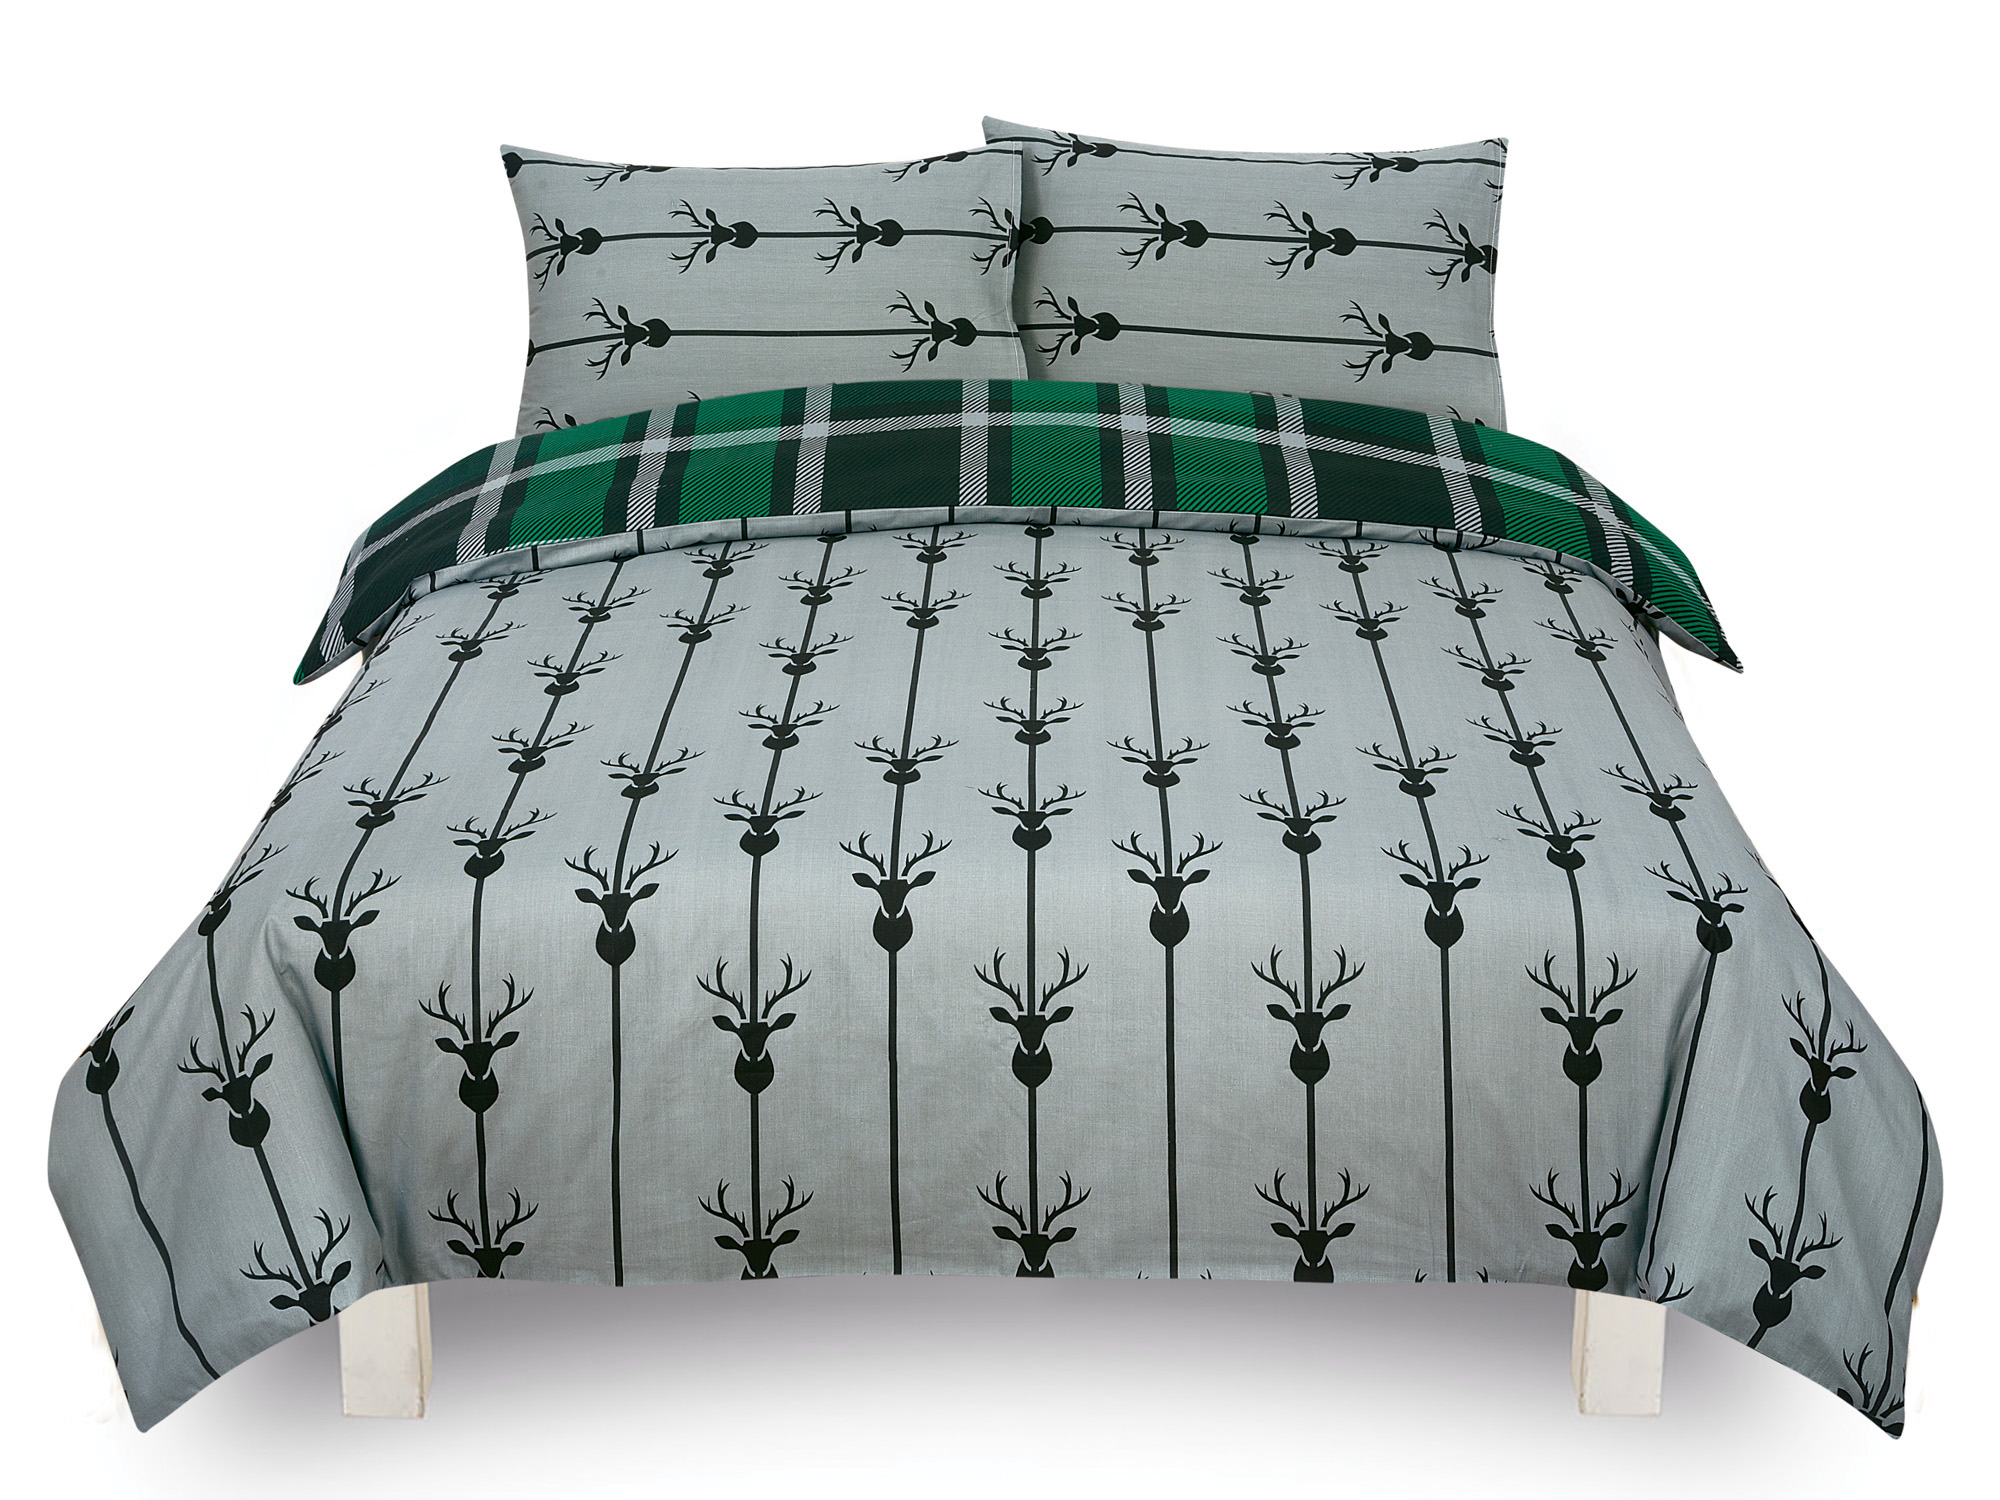 Check-Stag-Tartan-Deer-Antlers-Bedding-Single-Double-King-Duvet-Quilt-Cover-Set miniatura 11